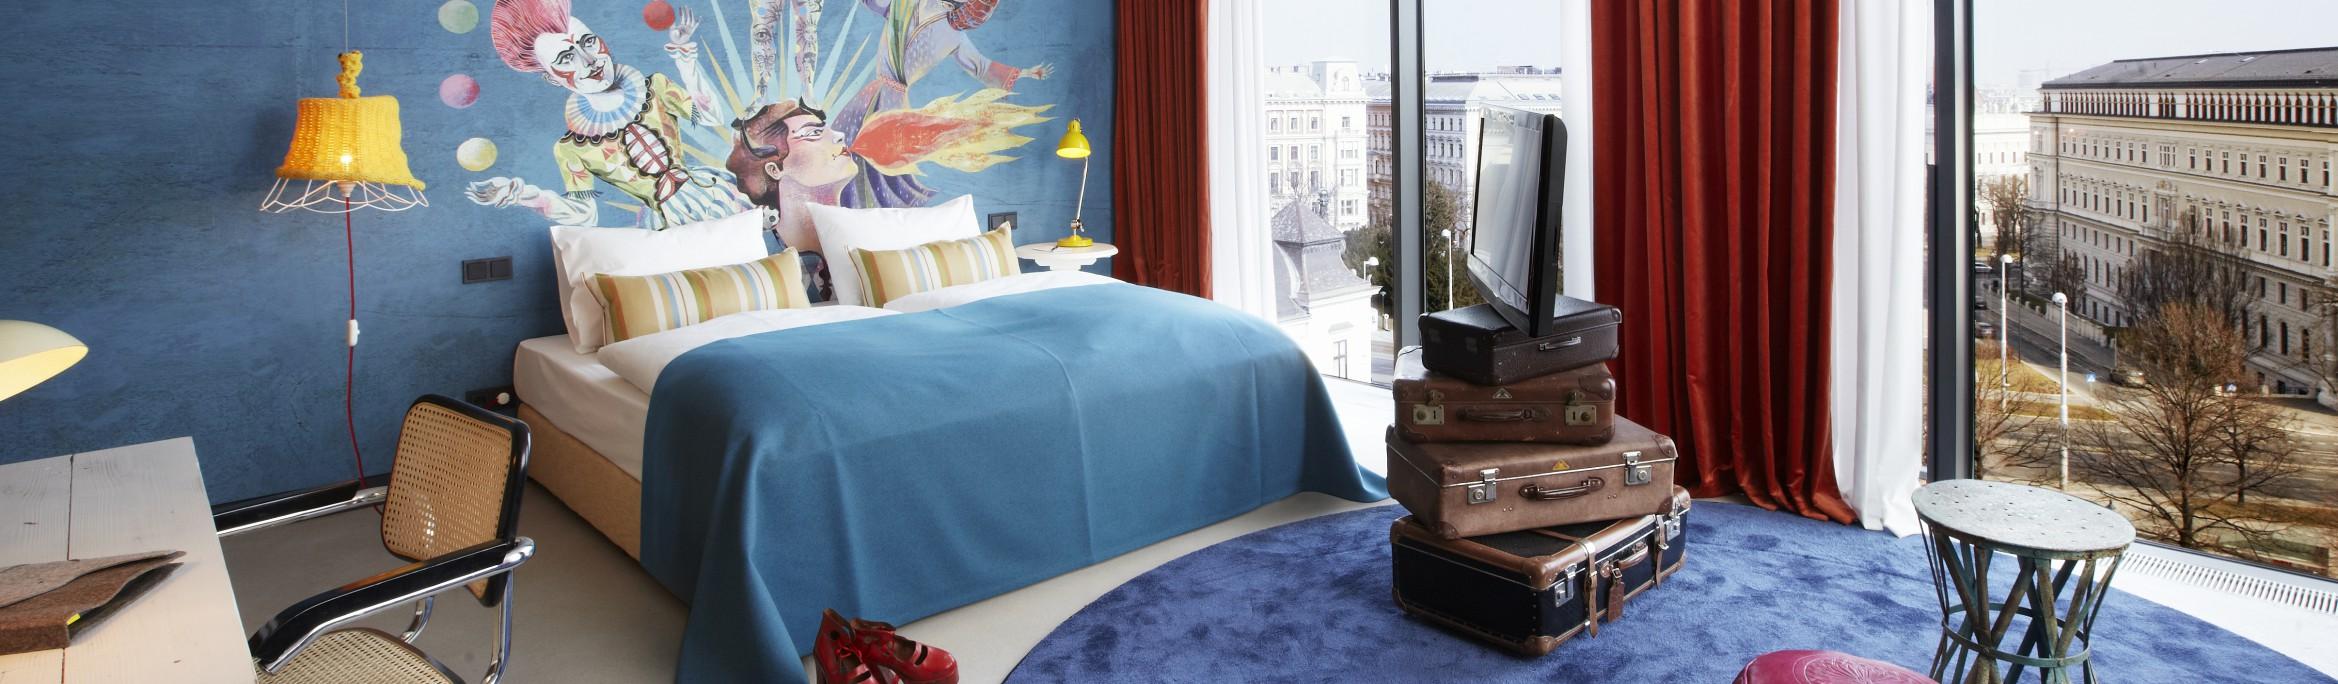 25hours Hotel Wien beim MuseumsQuartier | Jetzt Buchen